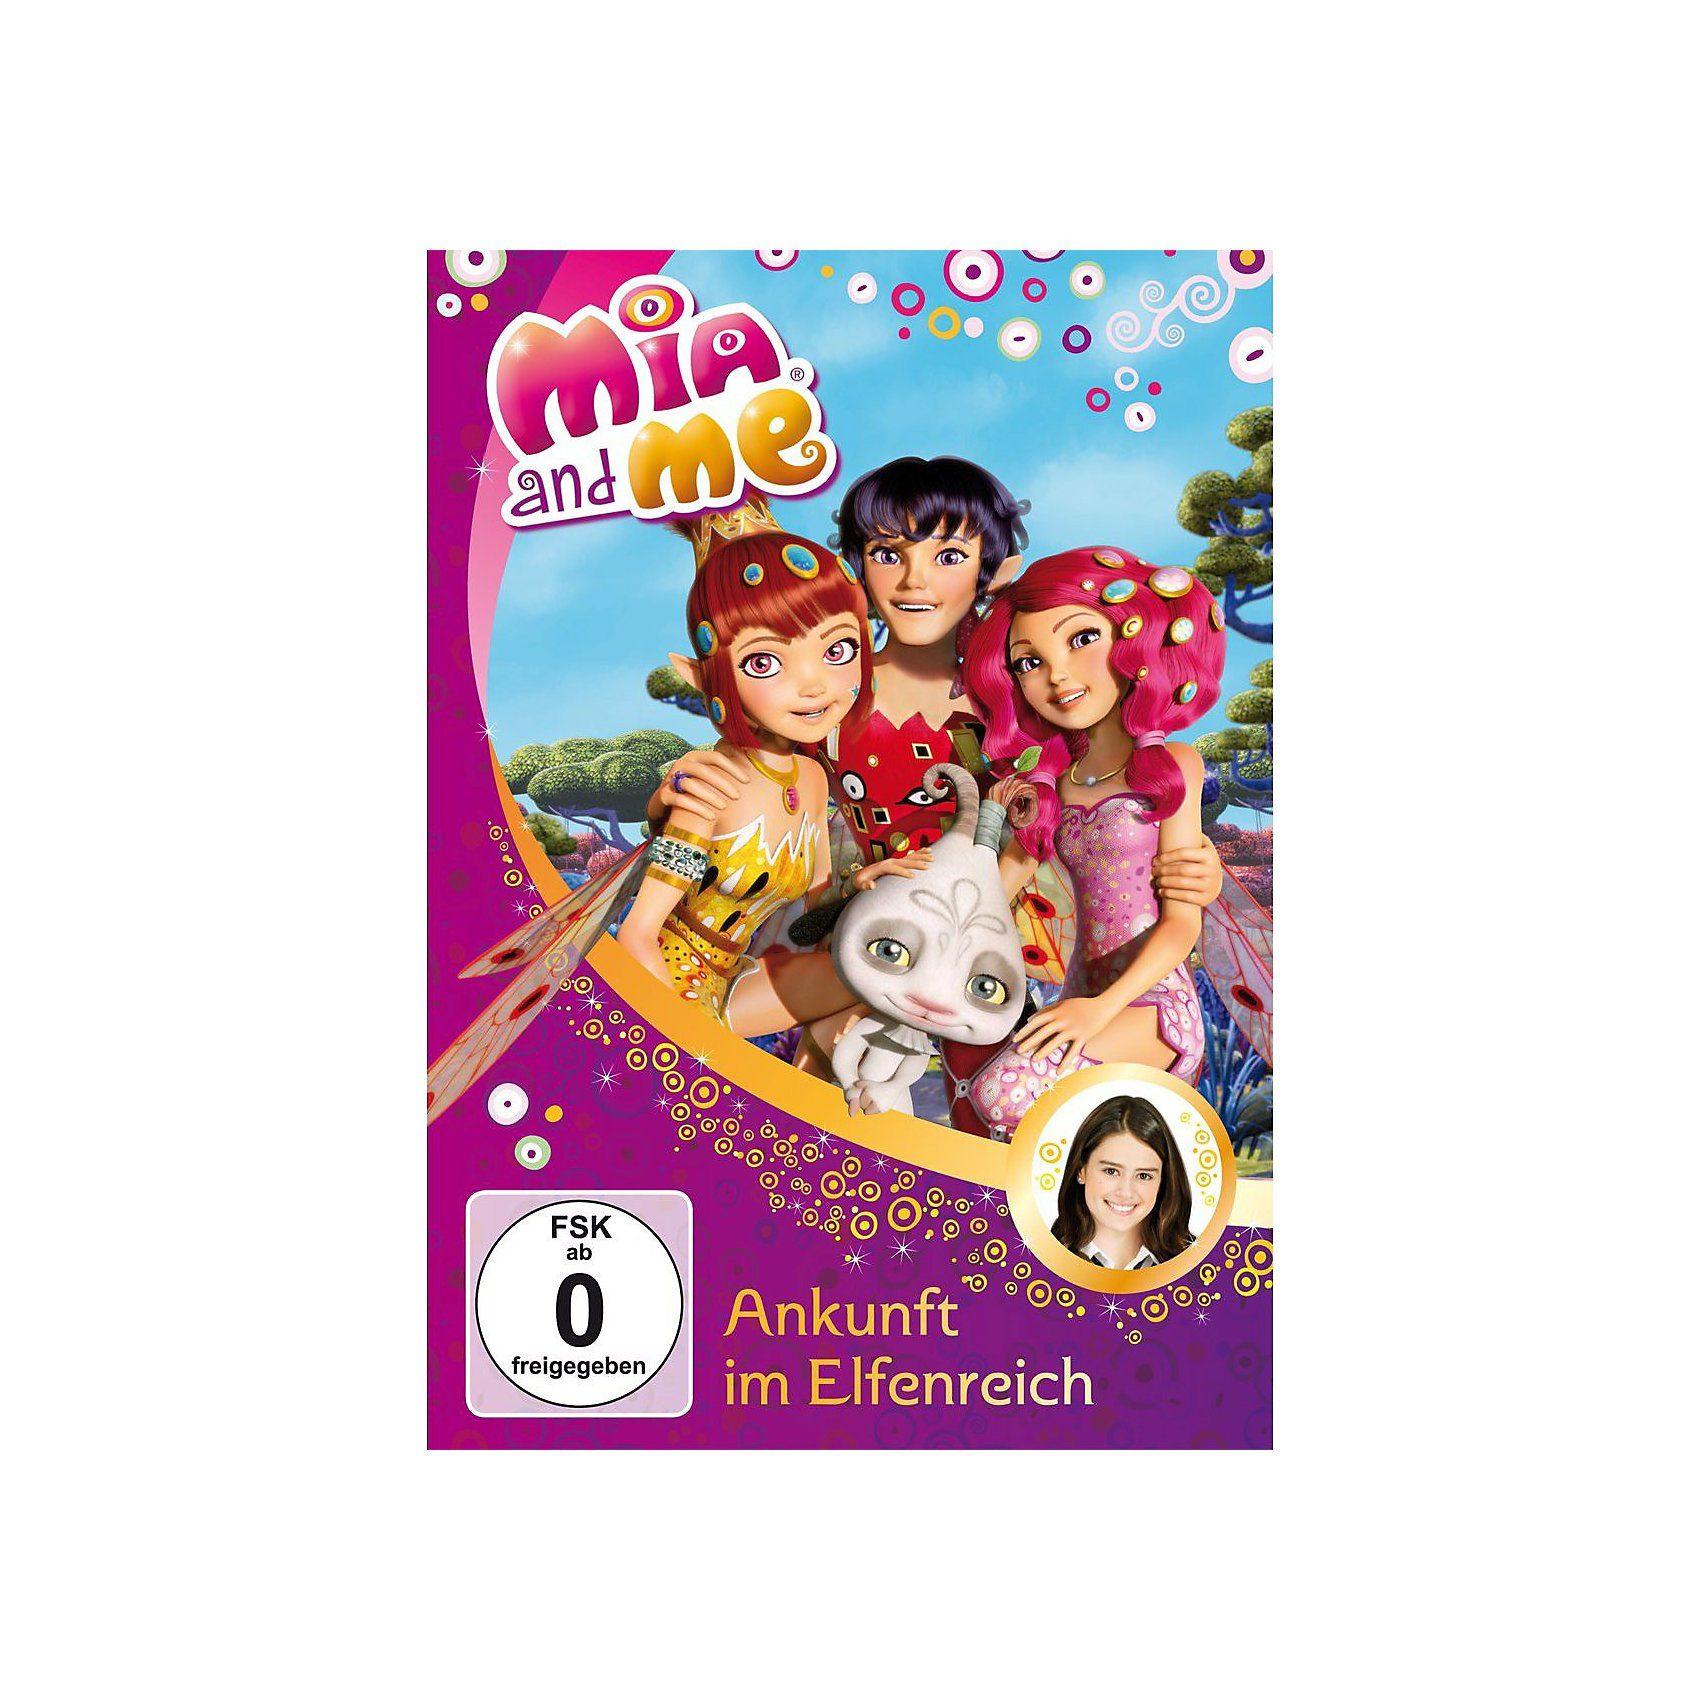 Edel DVD Mia and me 01 - Ankunft im Elfenreich